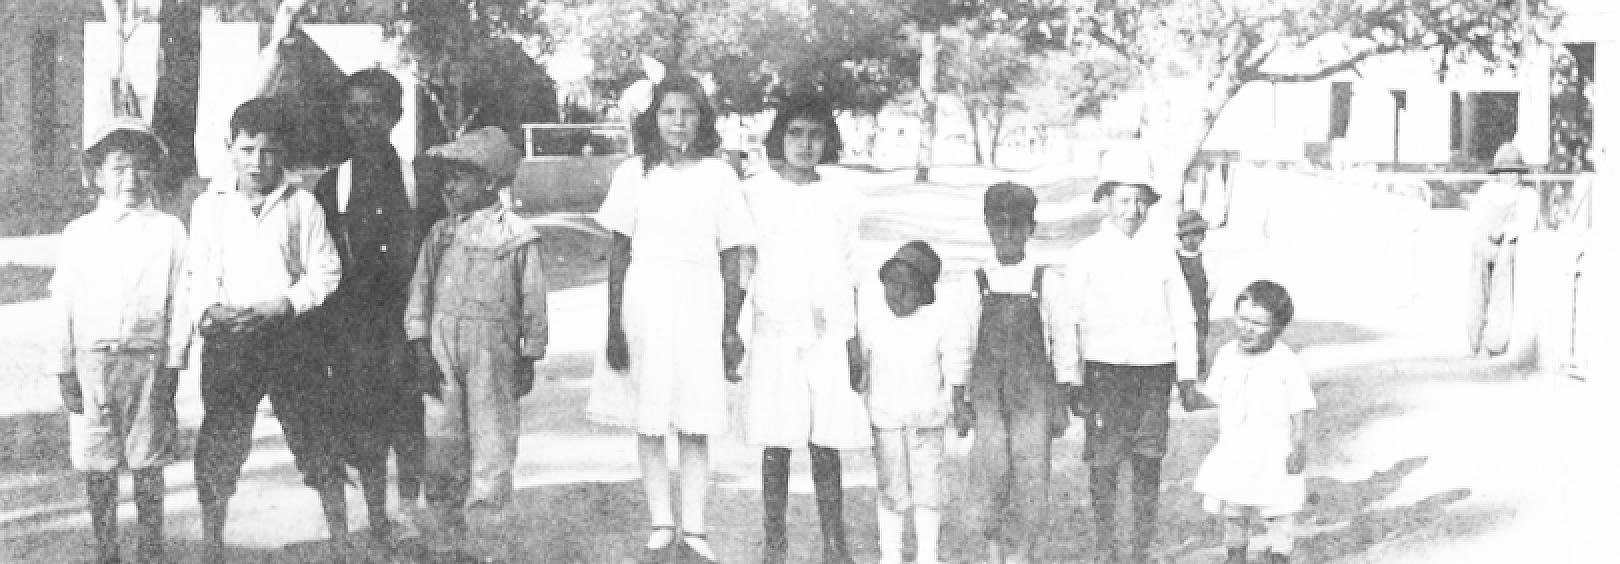 Photo: New Mexico children, (by L. Cunningham, 1917, public domain).